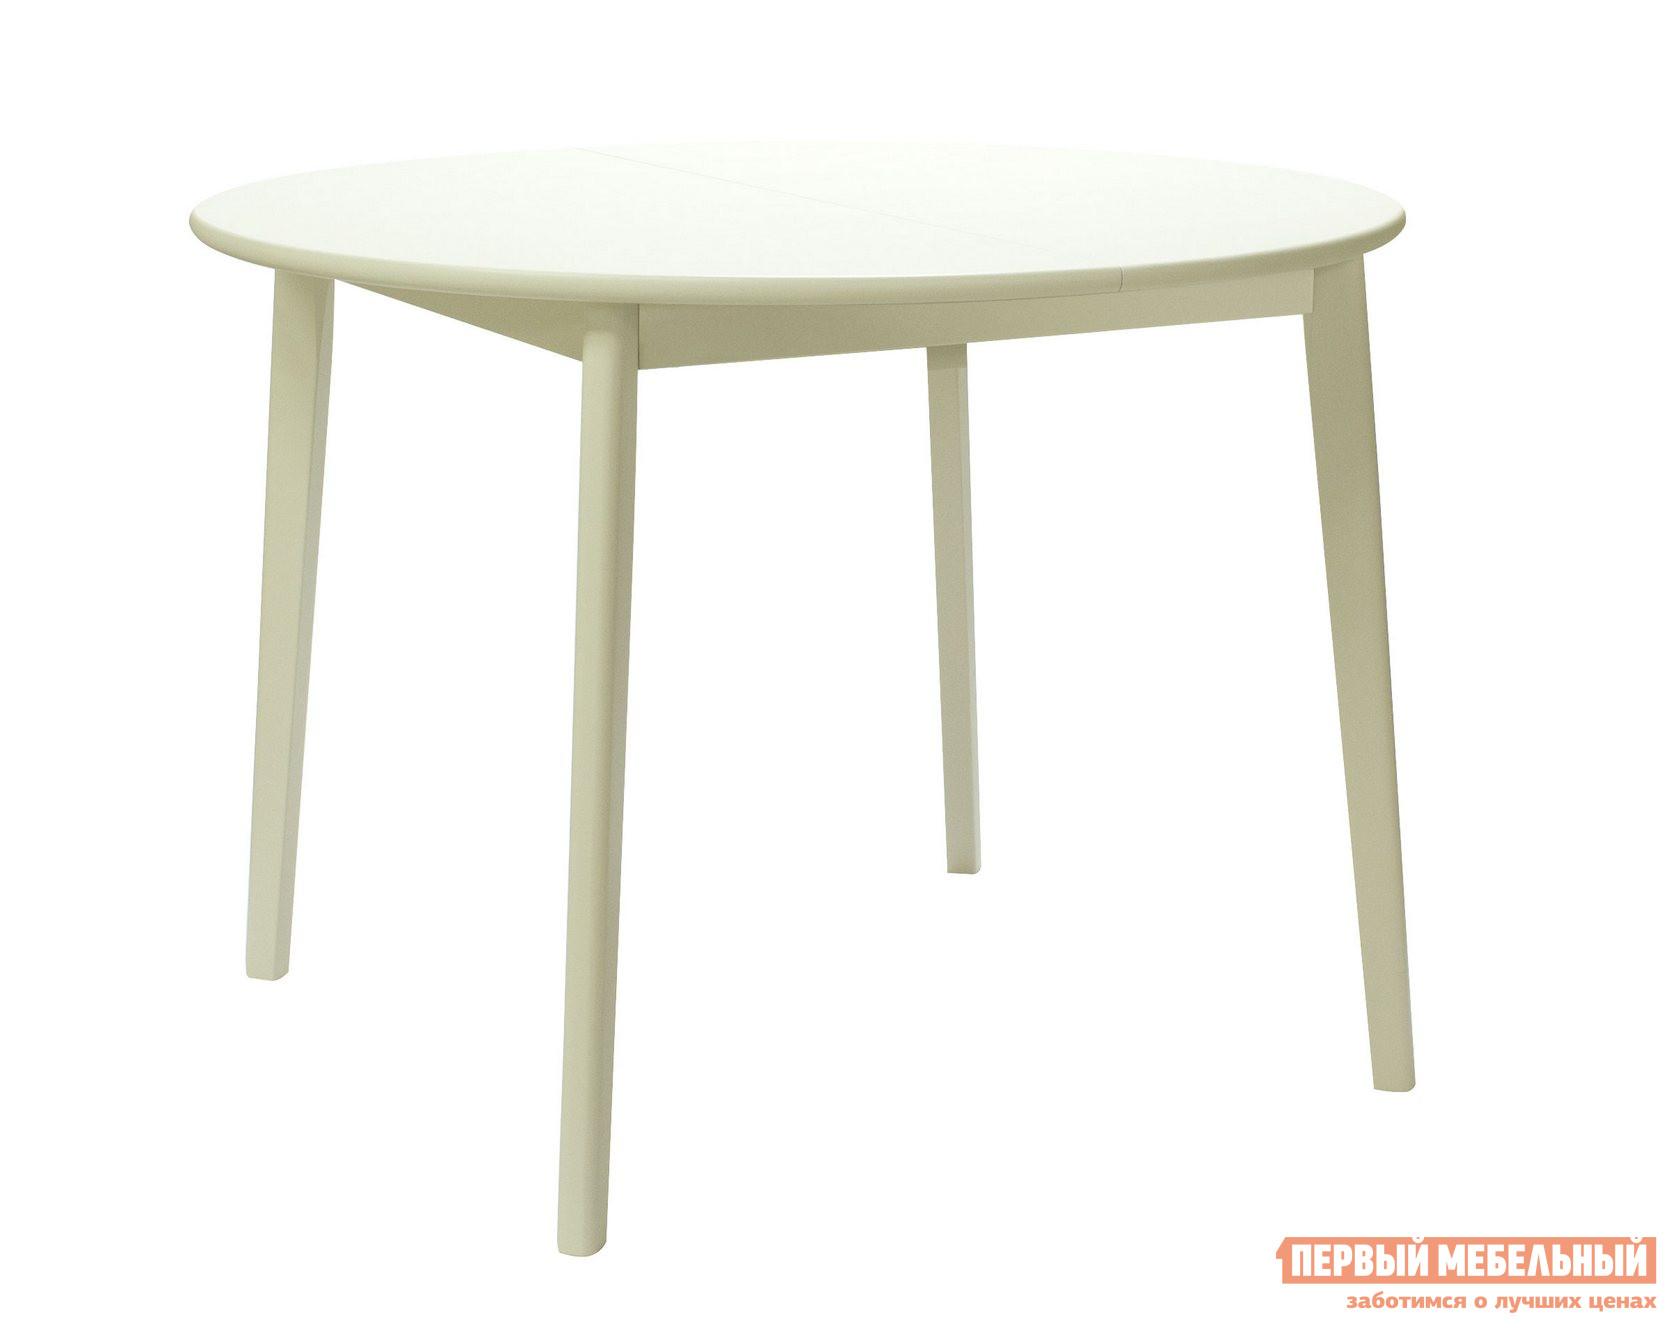 Обеденный стол Mebwill Стол Орион (Тауэр)